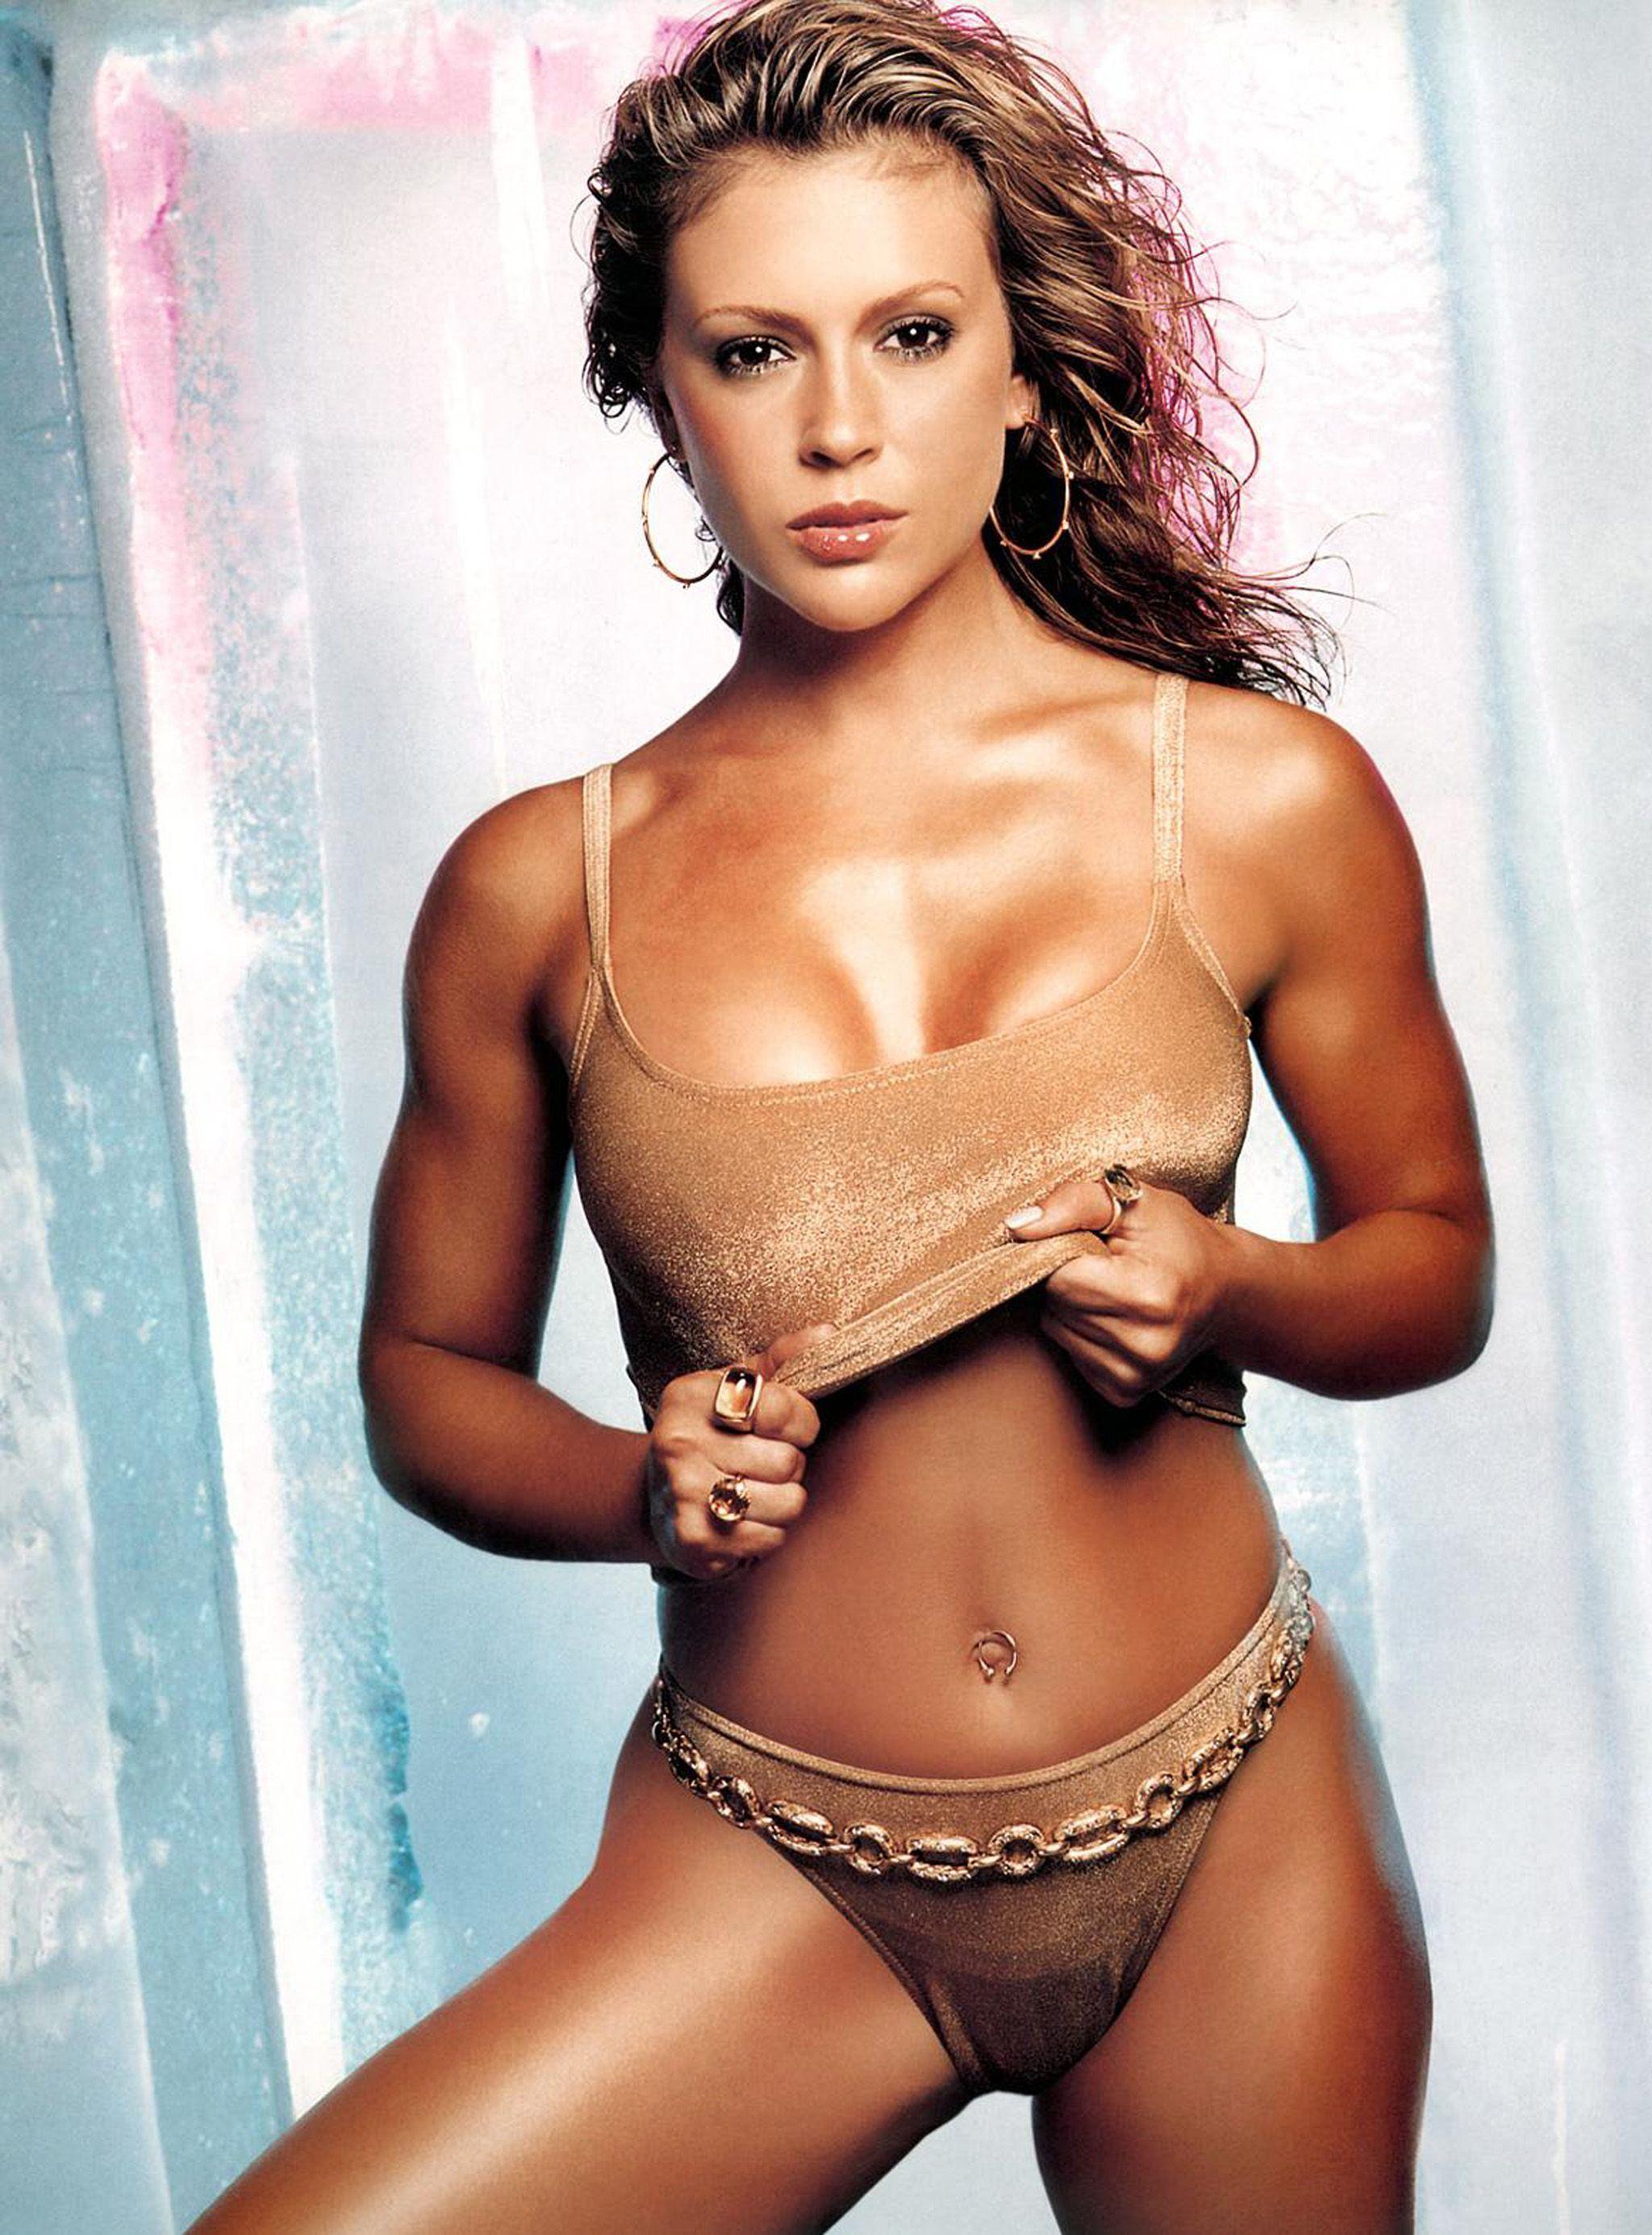 best of Milanno nude pics Alyssa